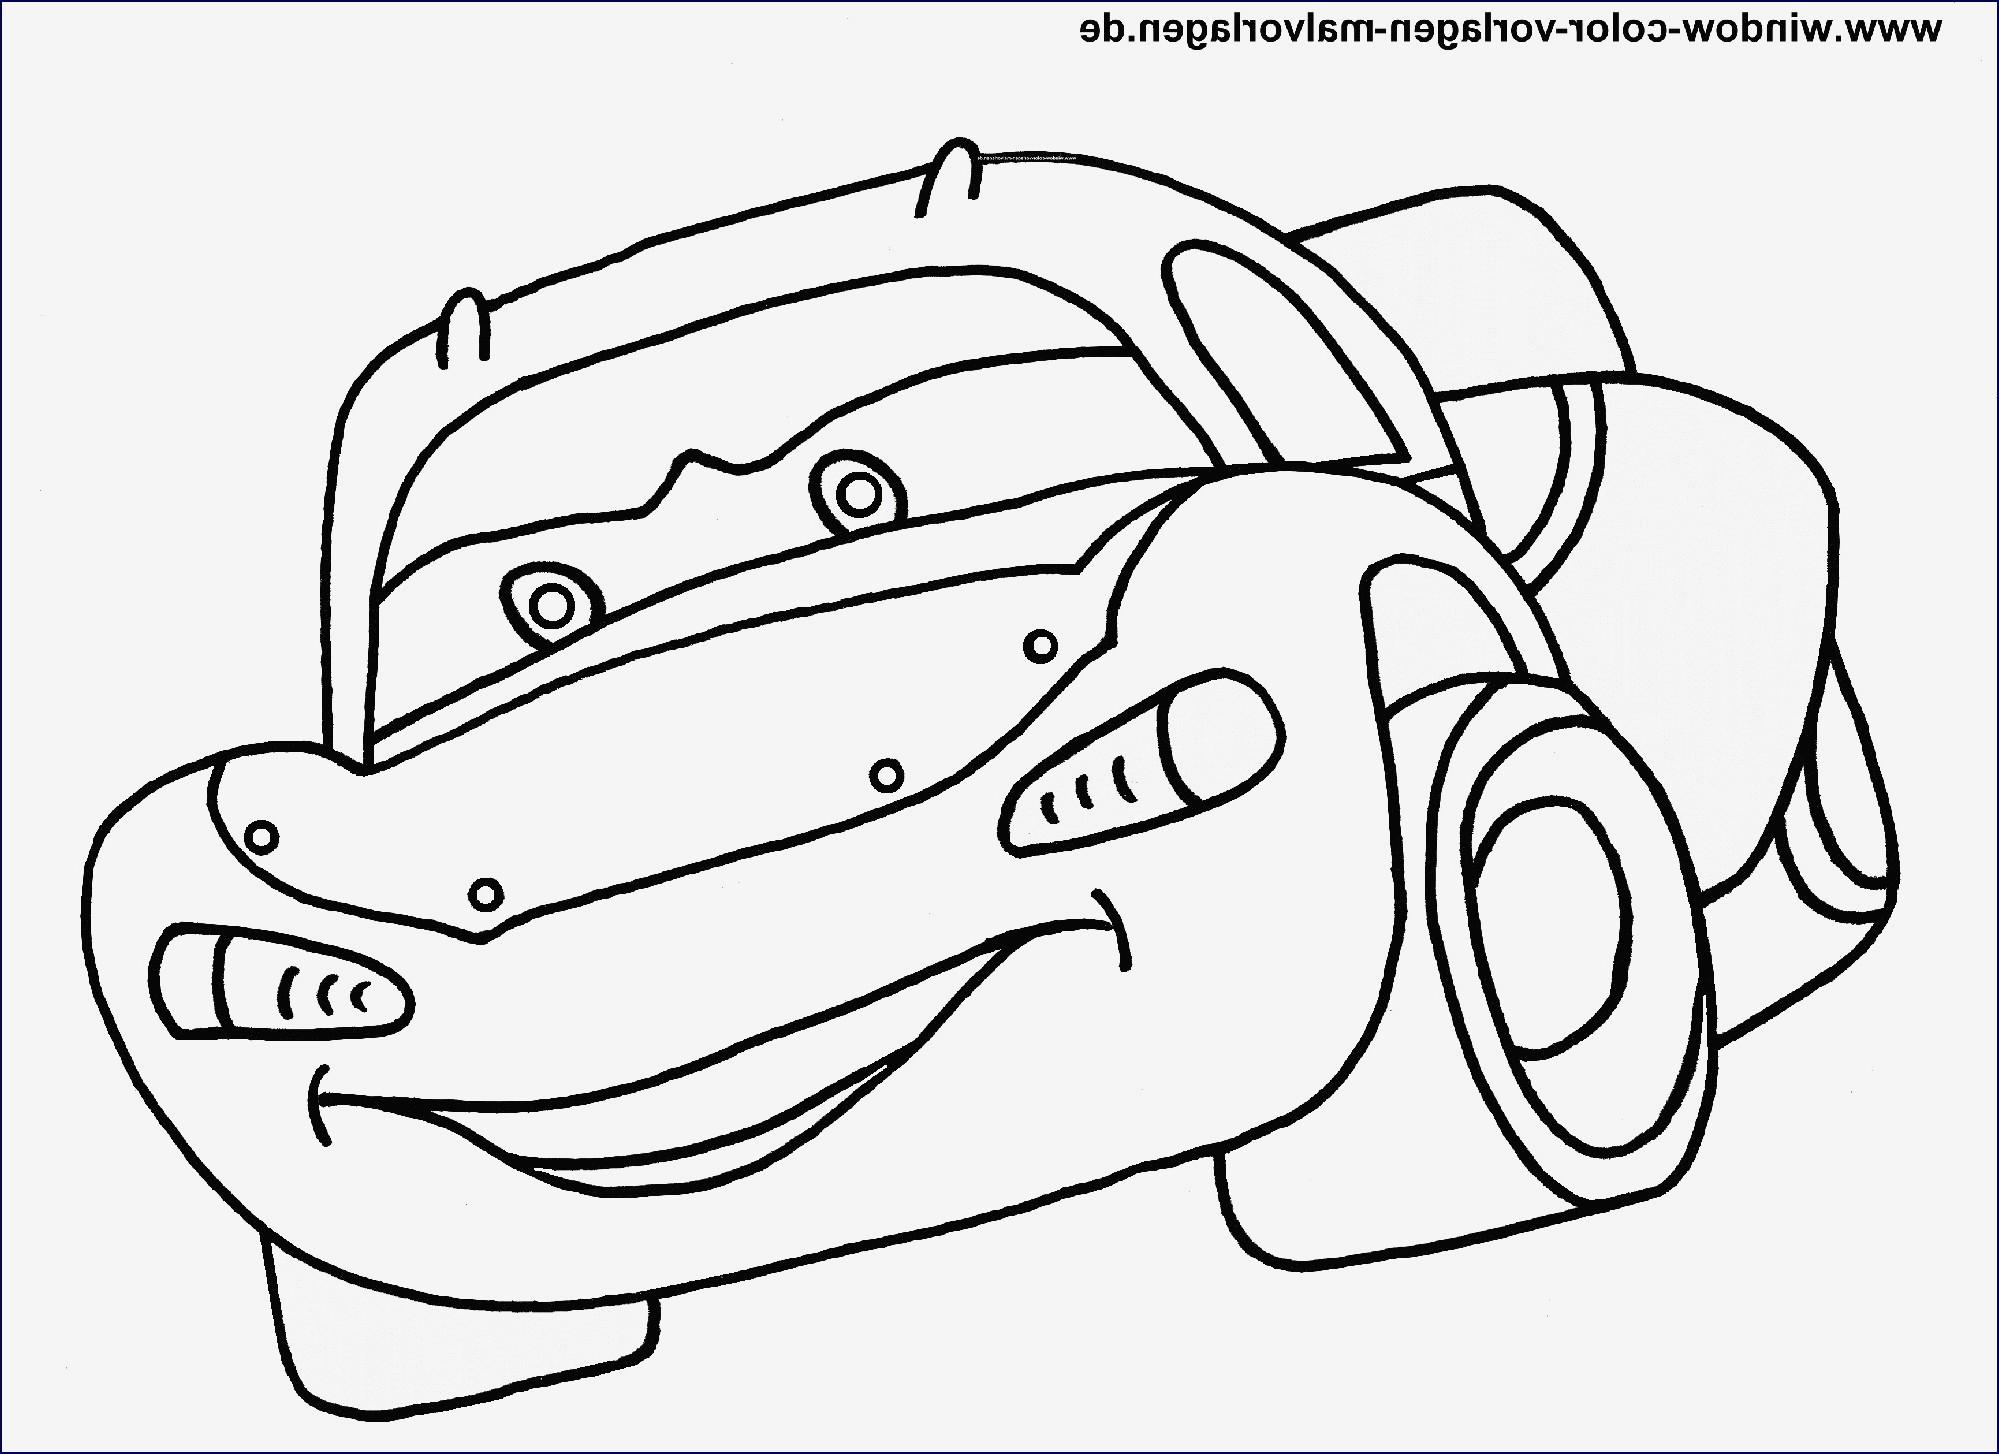 Ausmalbild Mandala Eule Genial 35 Luxus Eulen Ausmalbilder – Malvorlagen Ideen Das Bild